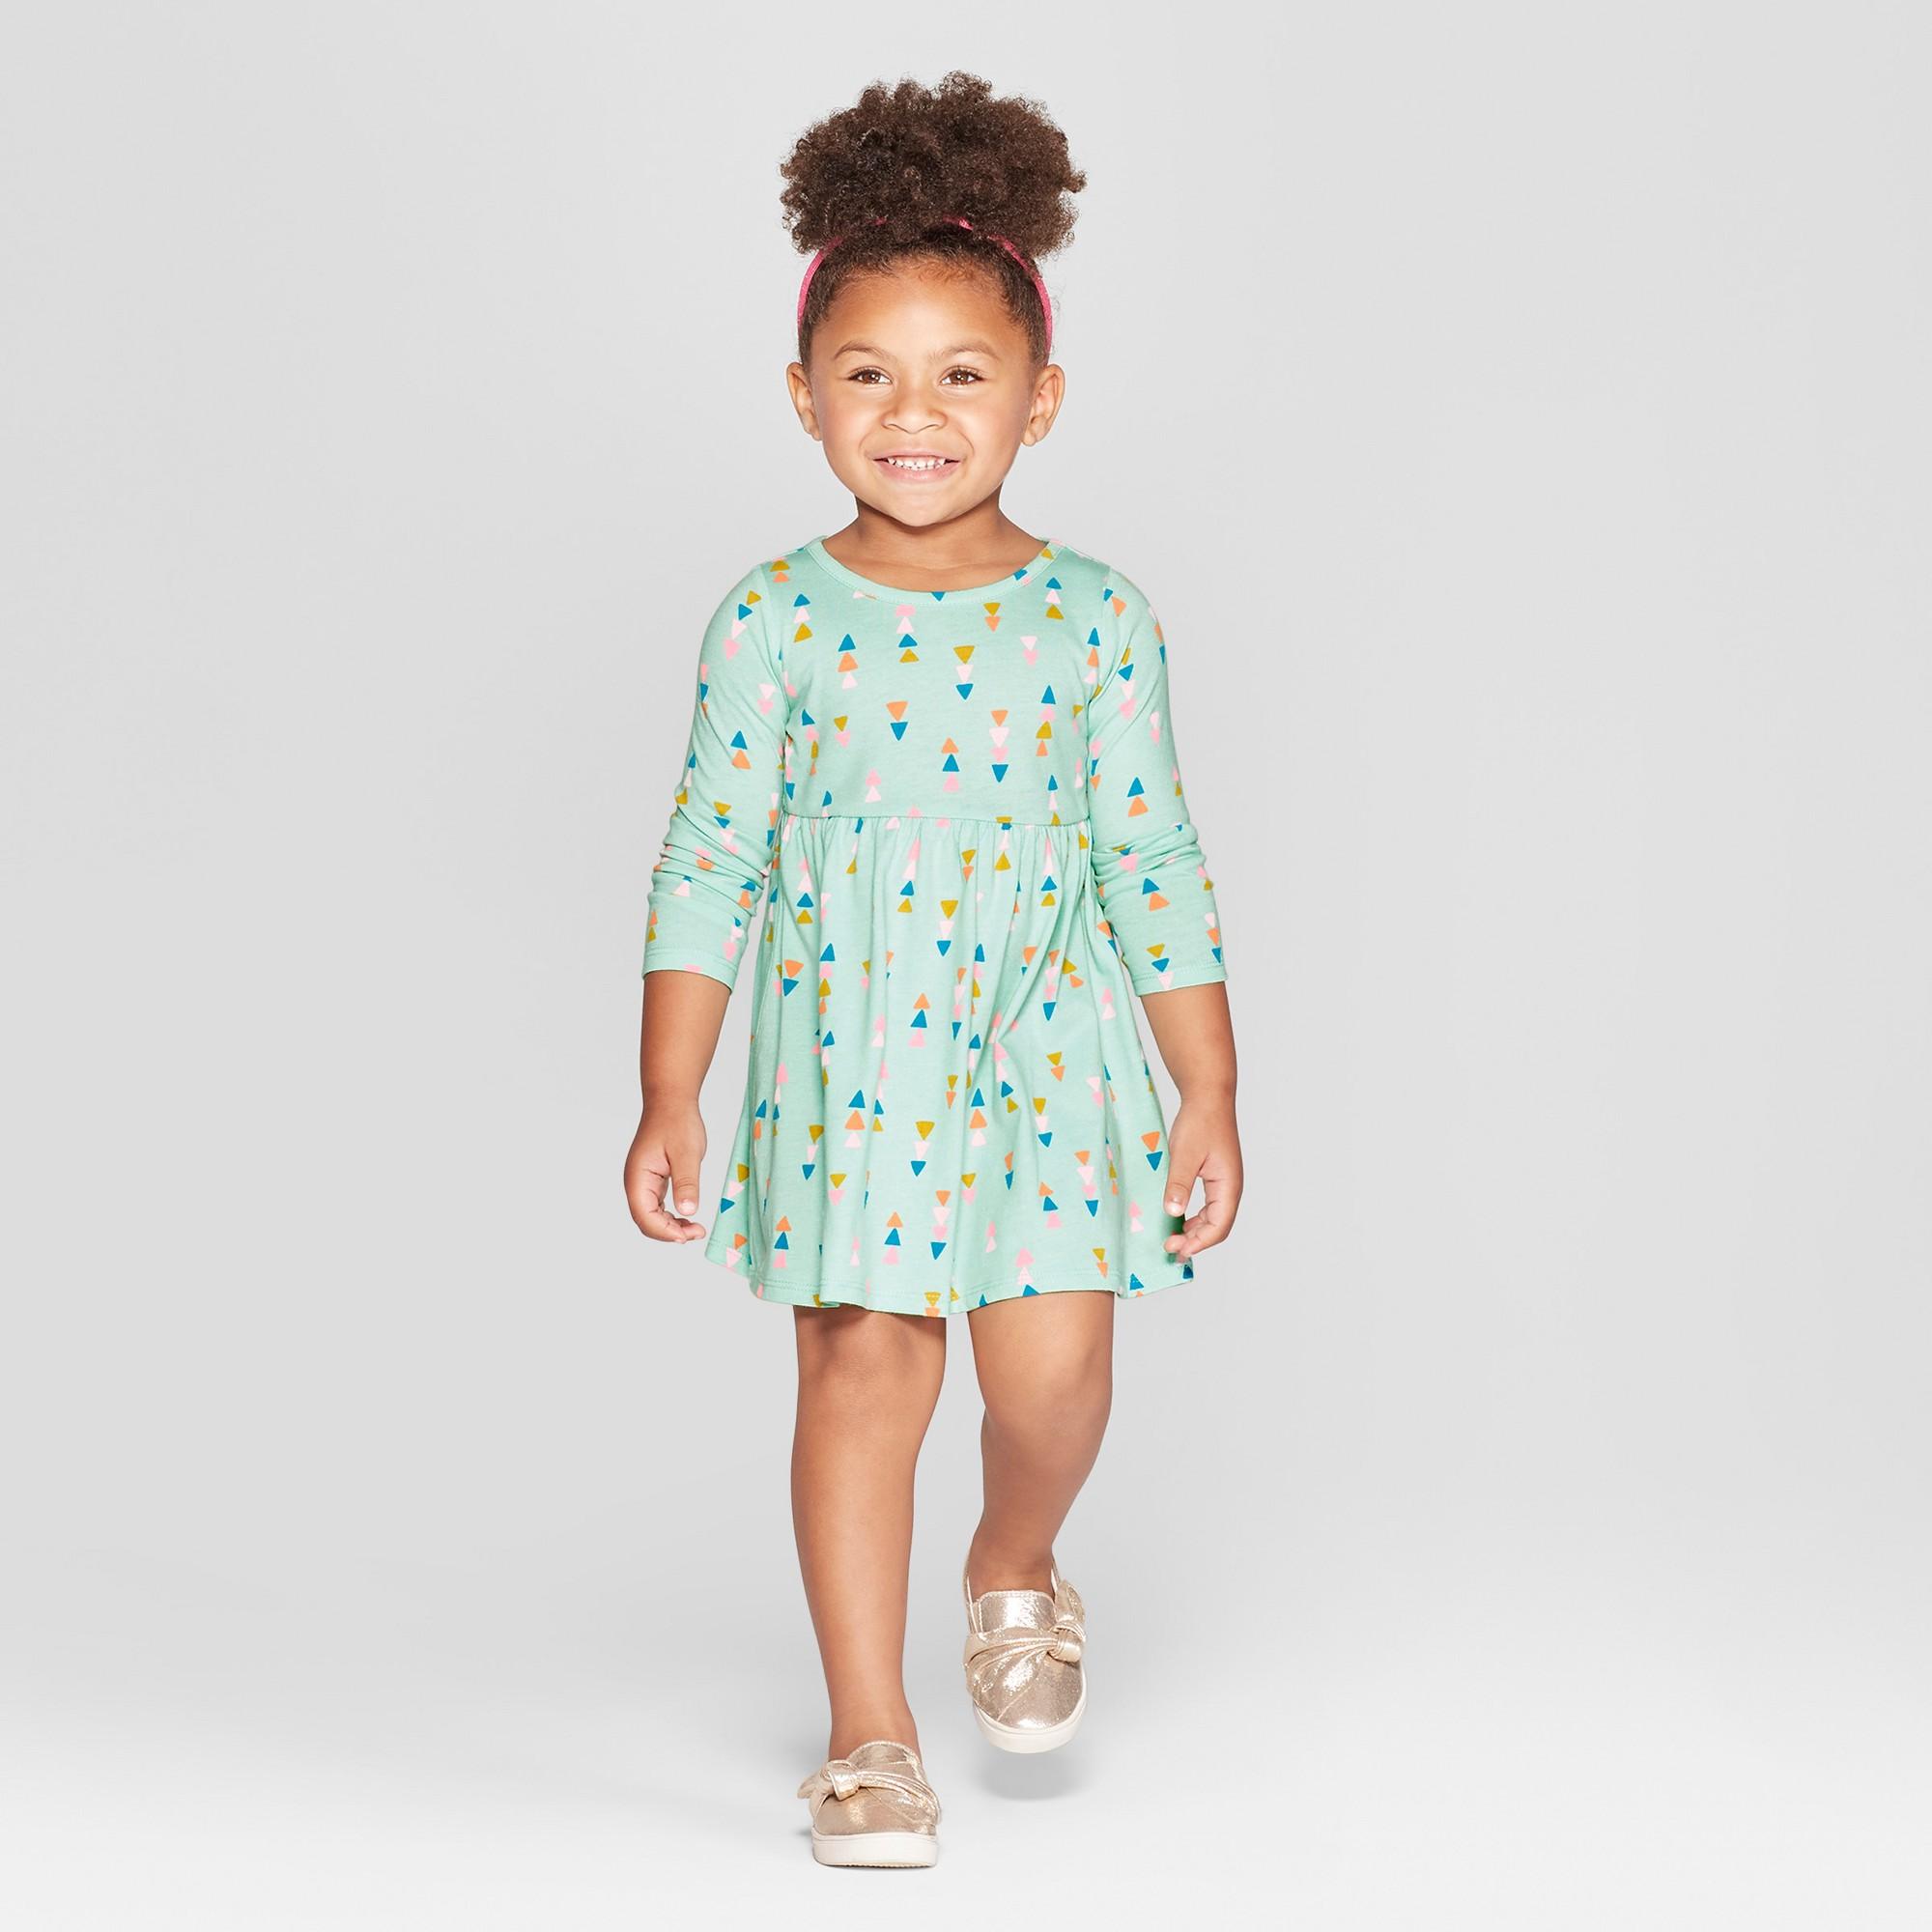 1c7d727fe97 Toddler Girls  Arrow All Over Print A-Line Dress - Cat   Jack Blue ...